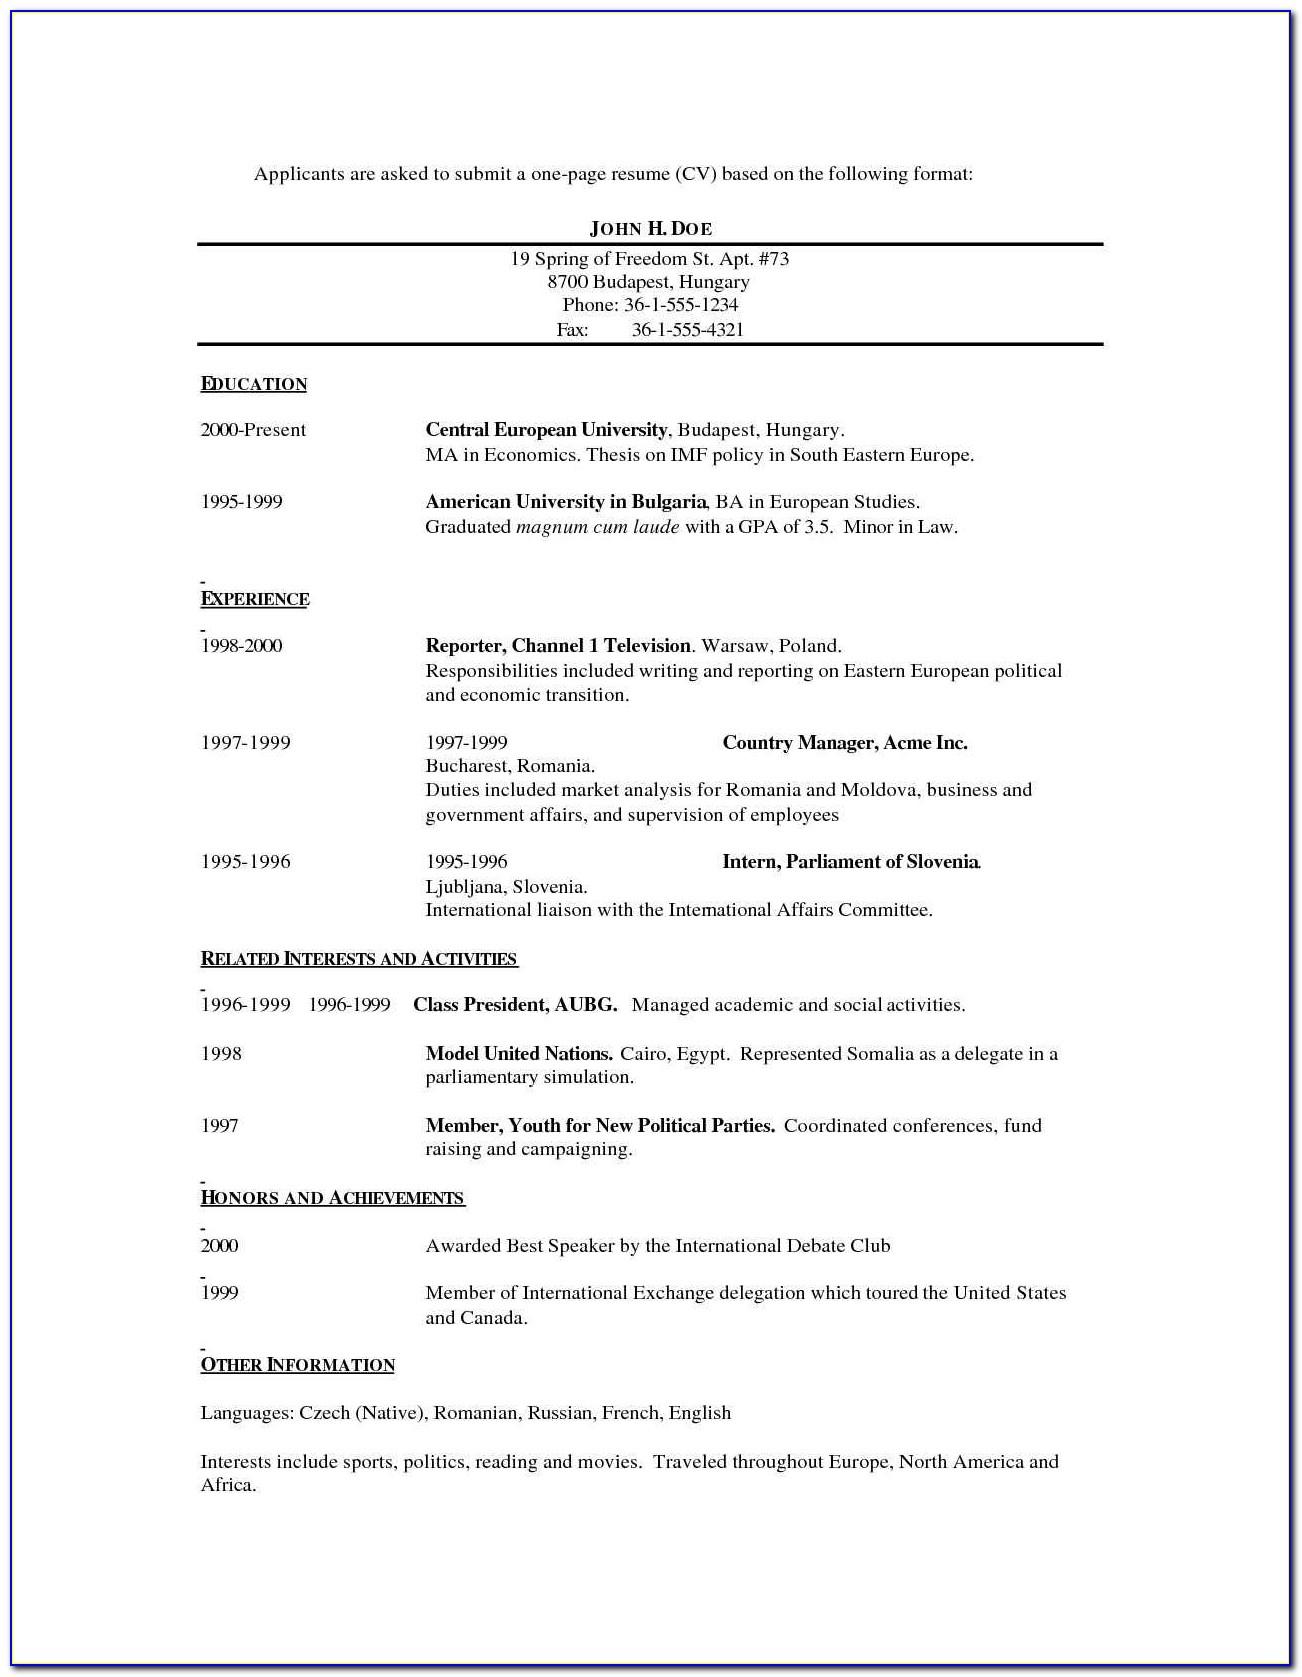 Best Resume Service Nyc. Denver Resume Writing Service Linkedin For Best Resume Writing Services Nyc